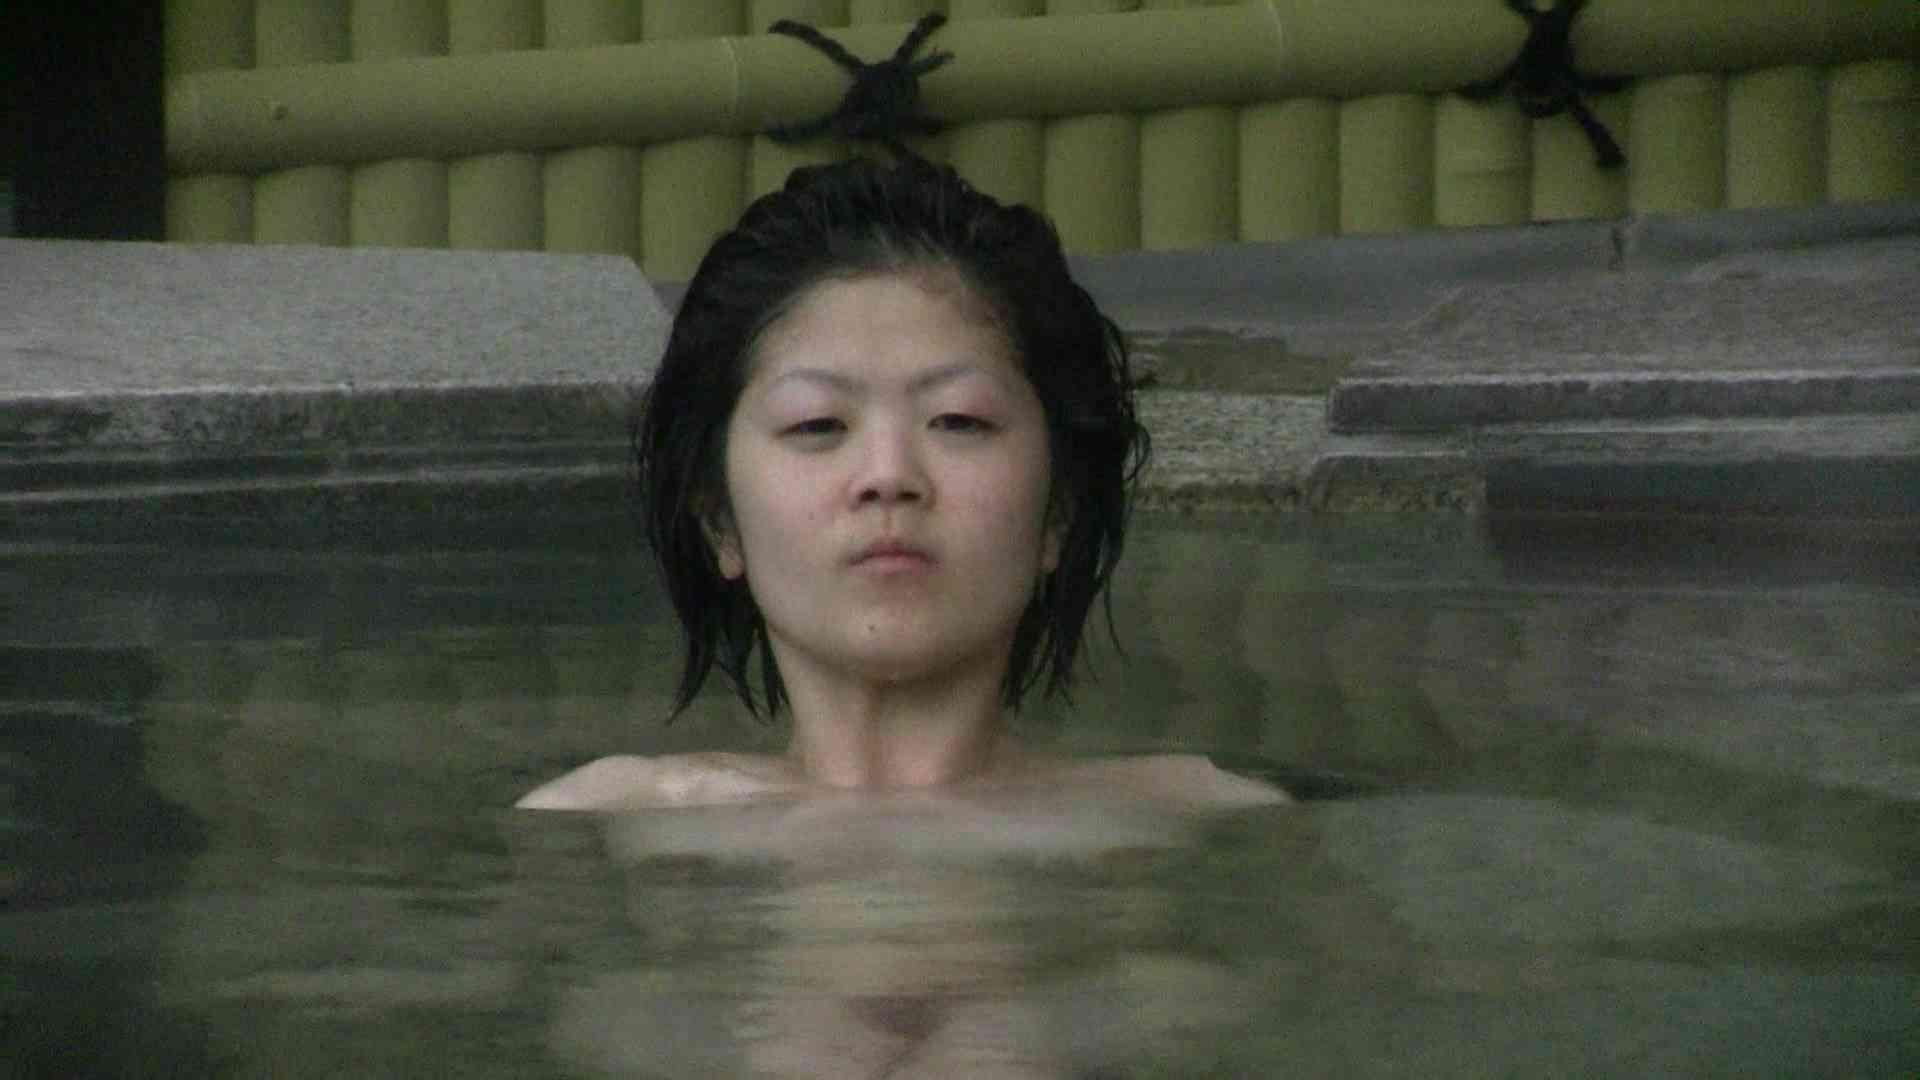 Aquaな露天風呂Vol.538 盗撮師作品 おめこ無修正動画無料 82pic 65